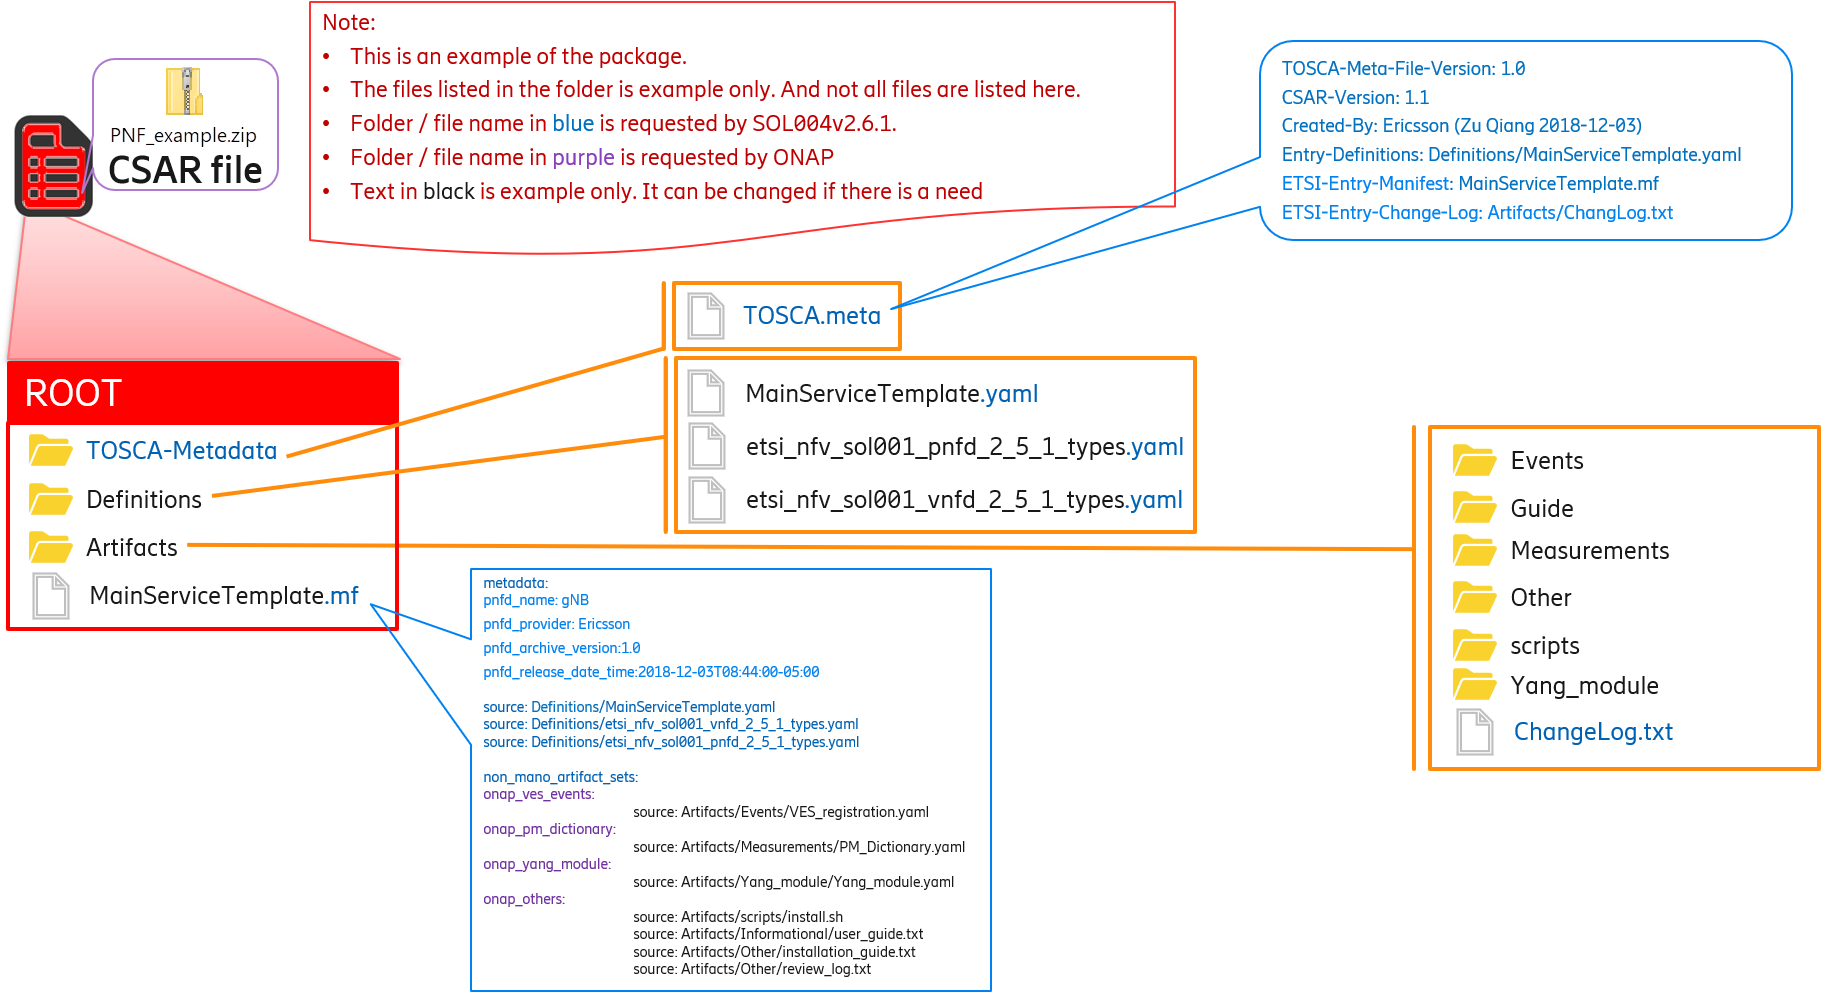 ONAP Non-MANO Artifacts Set Identifiers - Developer Wiki - Confluence